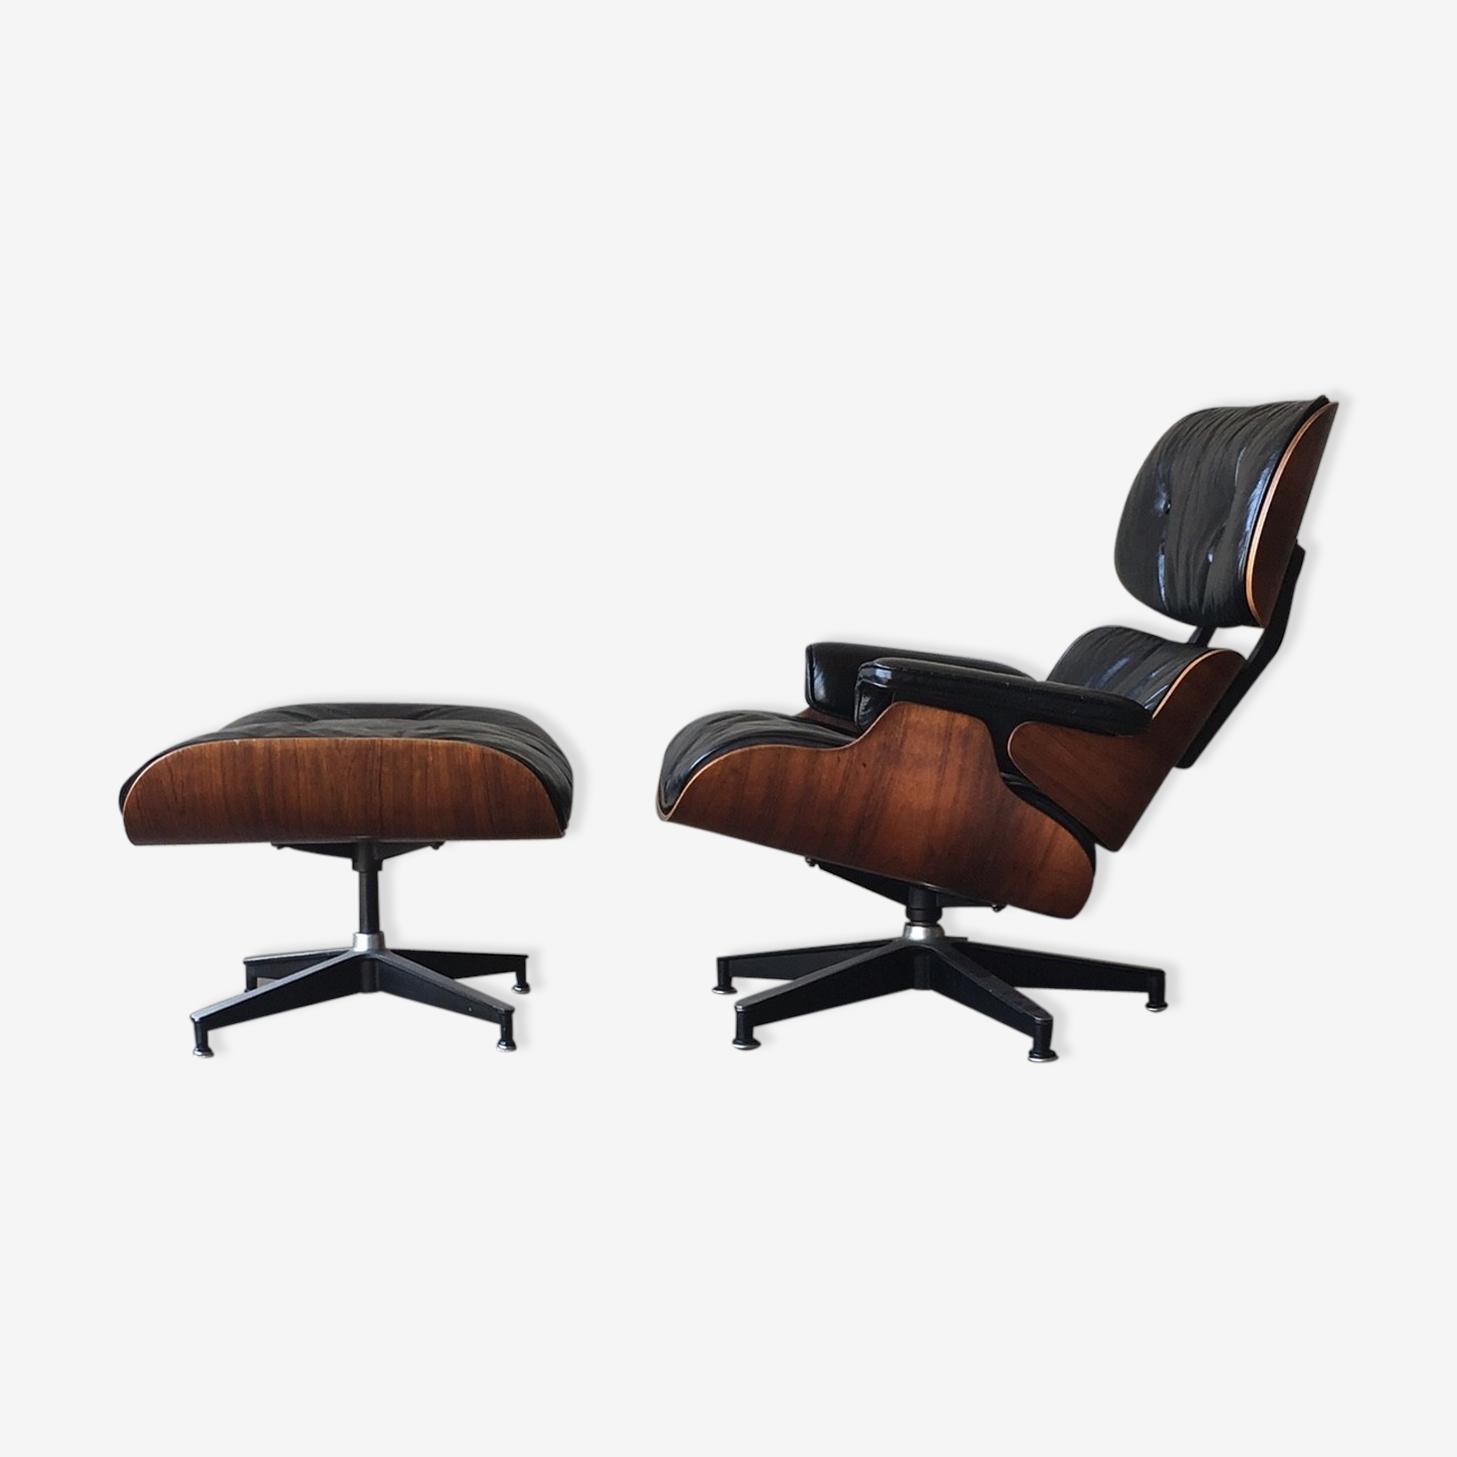 Fauteuil herman miller Eames lounge chair + ottoman